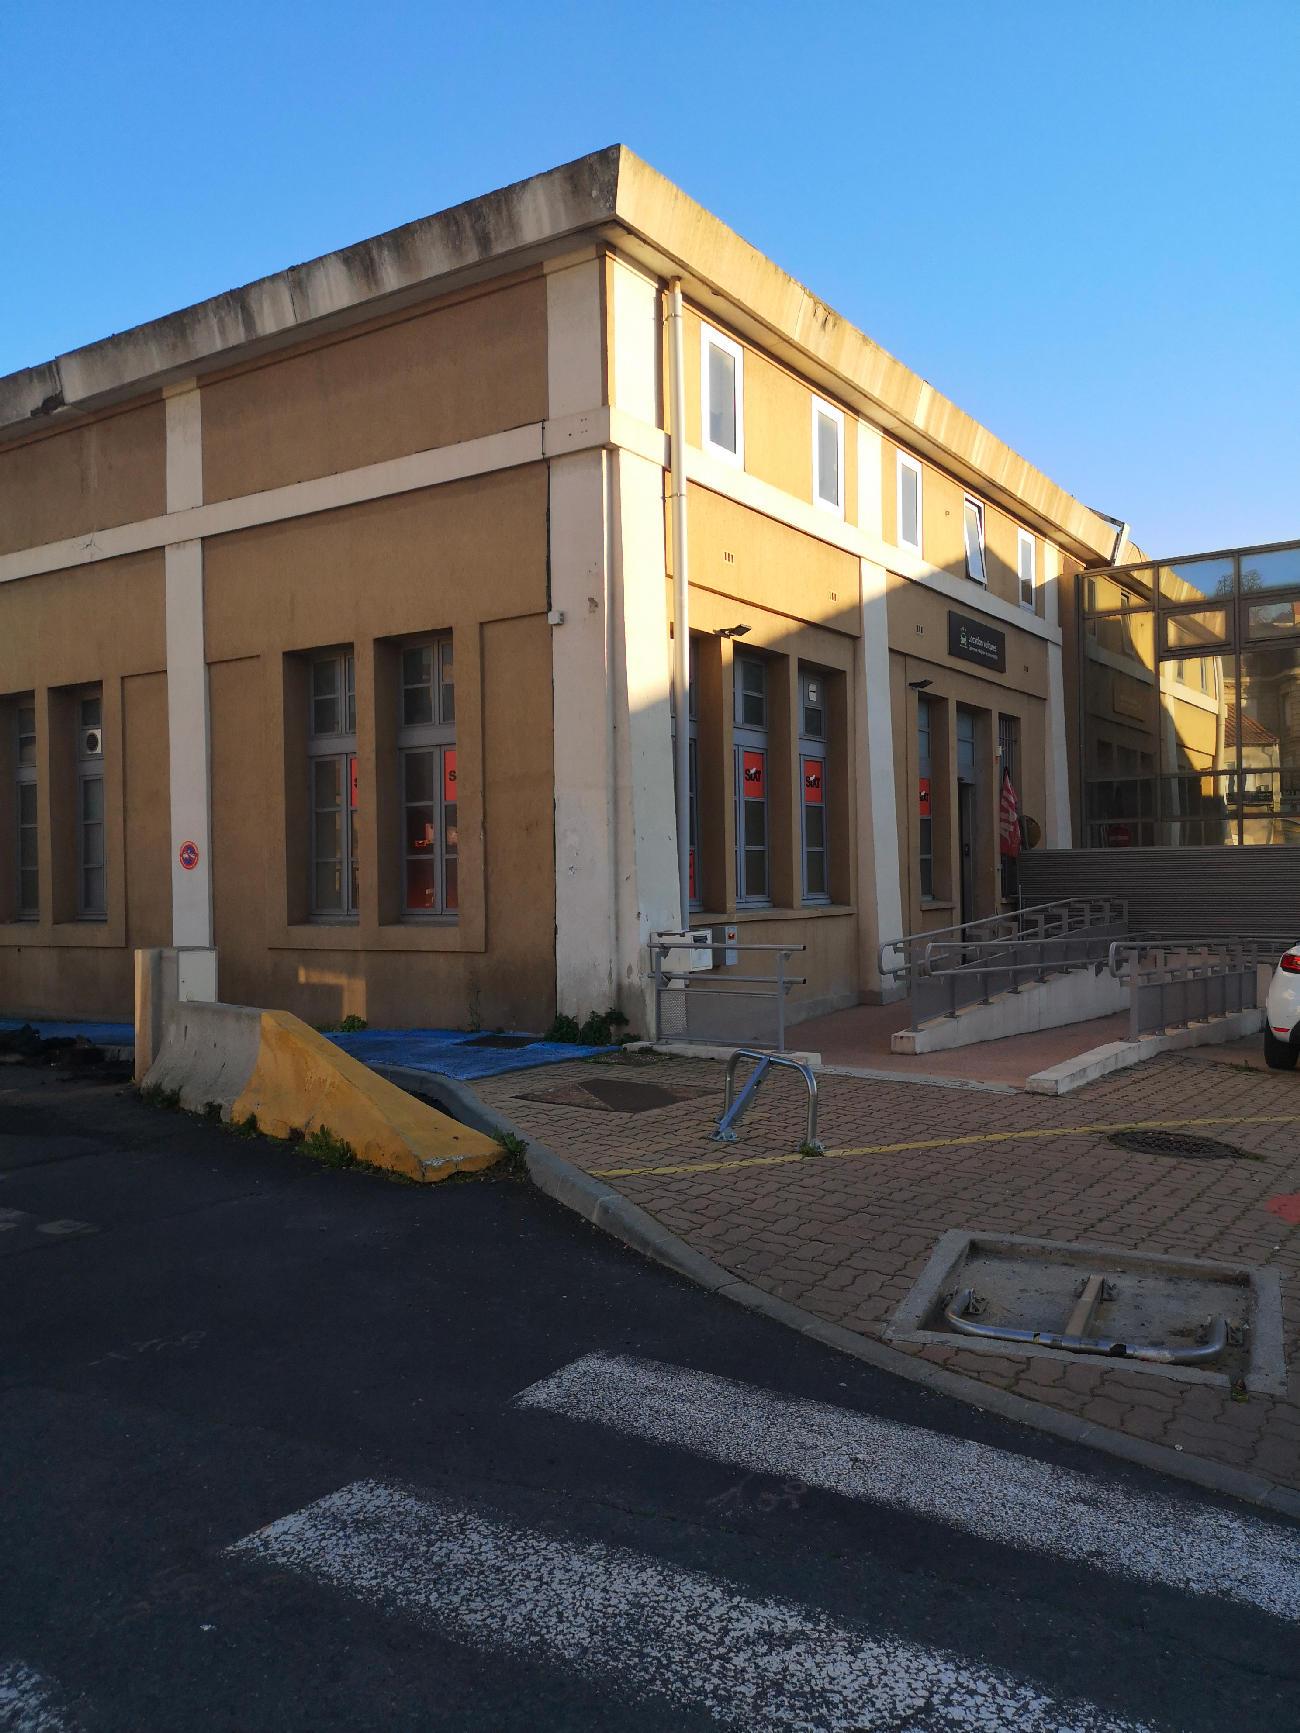 Sixt Béziers Gare